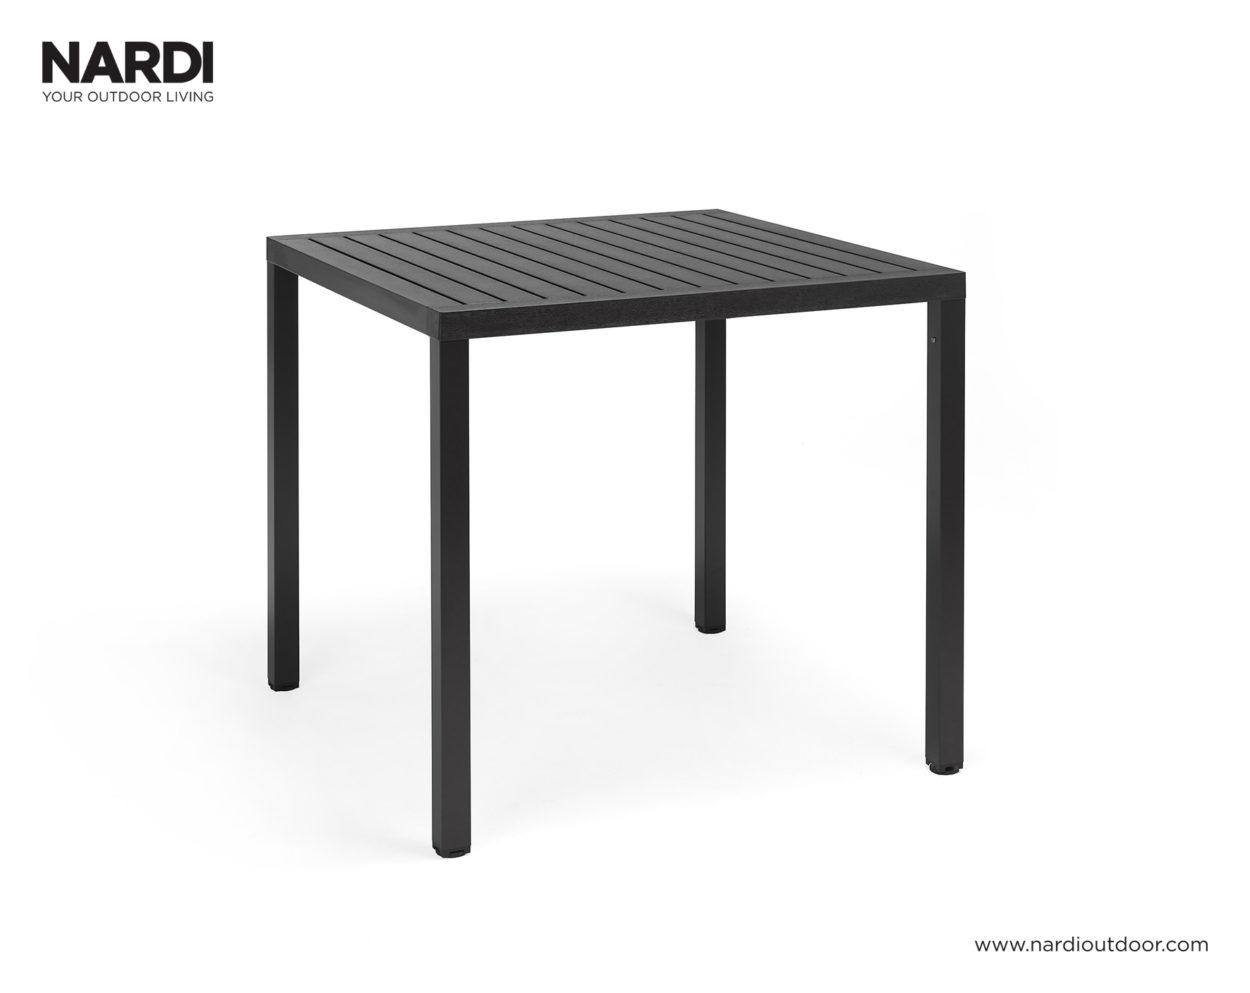 Nardi Tuintafel Cube 80x80 cm Antraciet